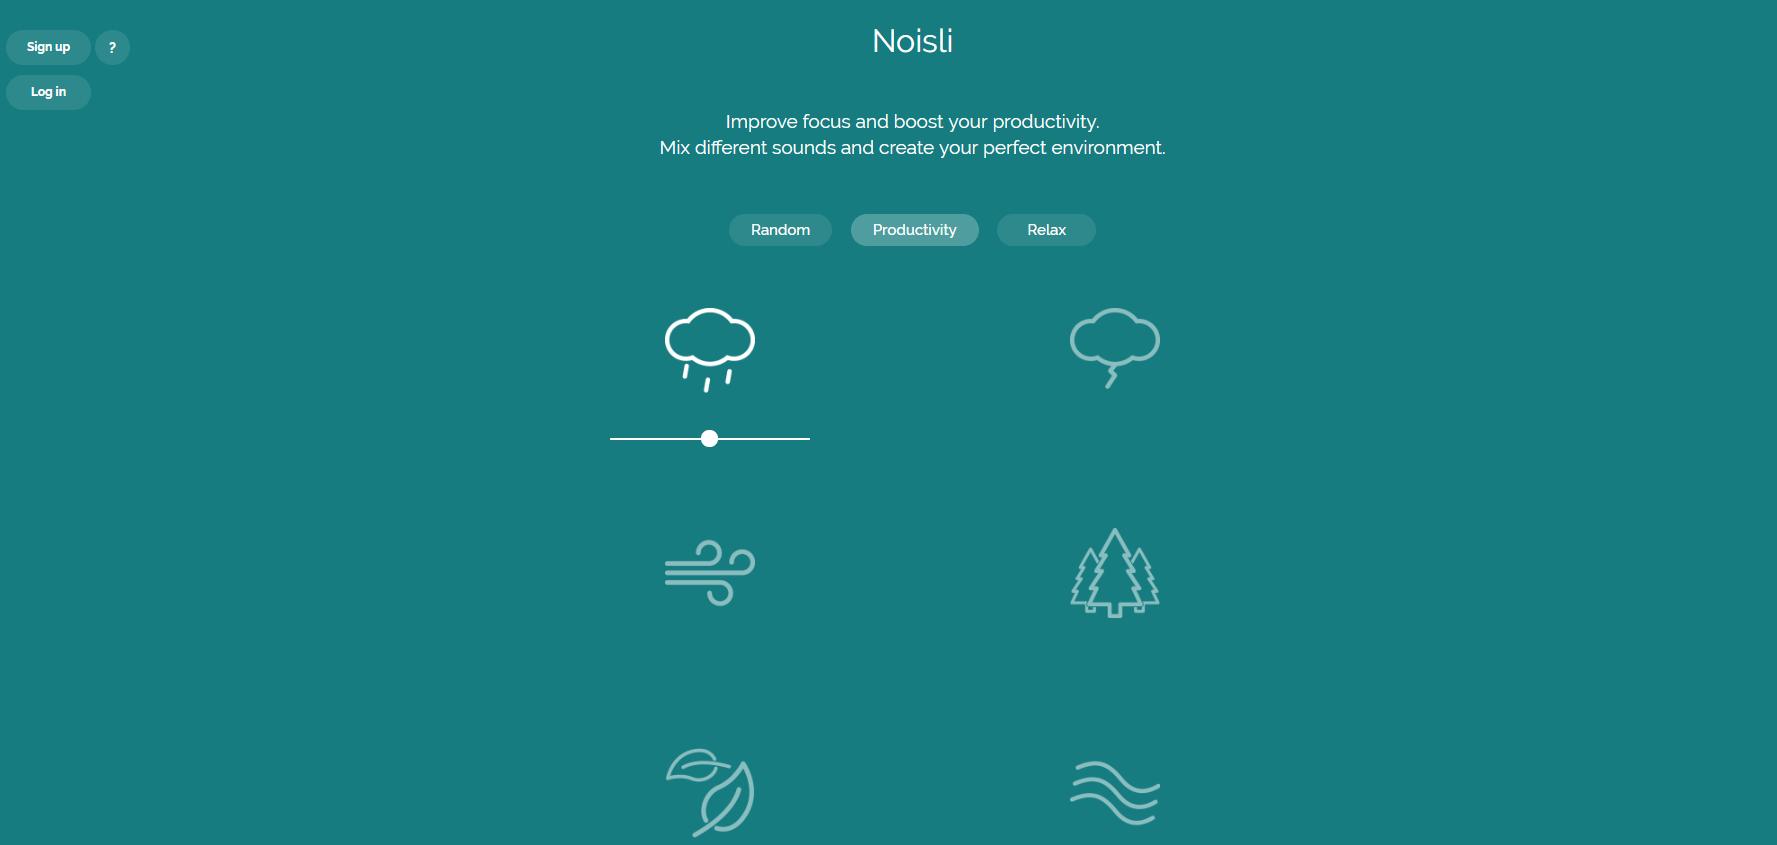 noisli tool to  boost developer productivity